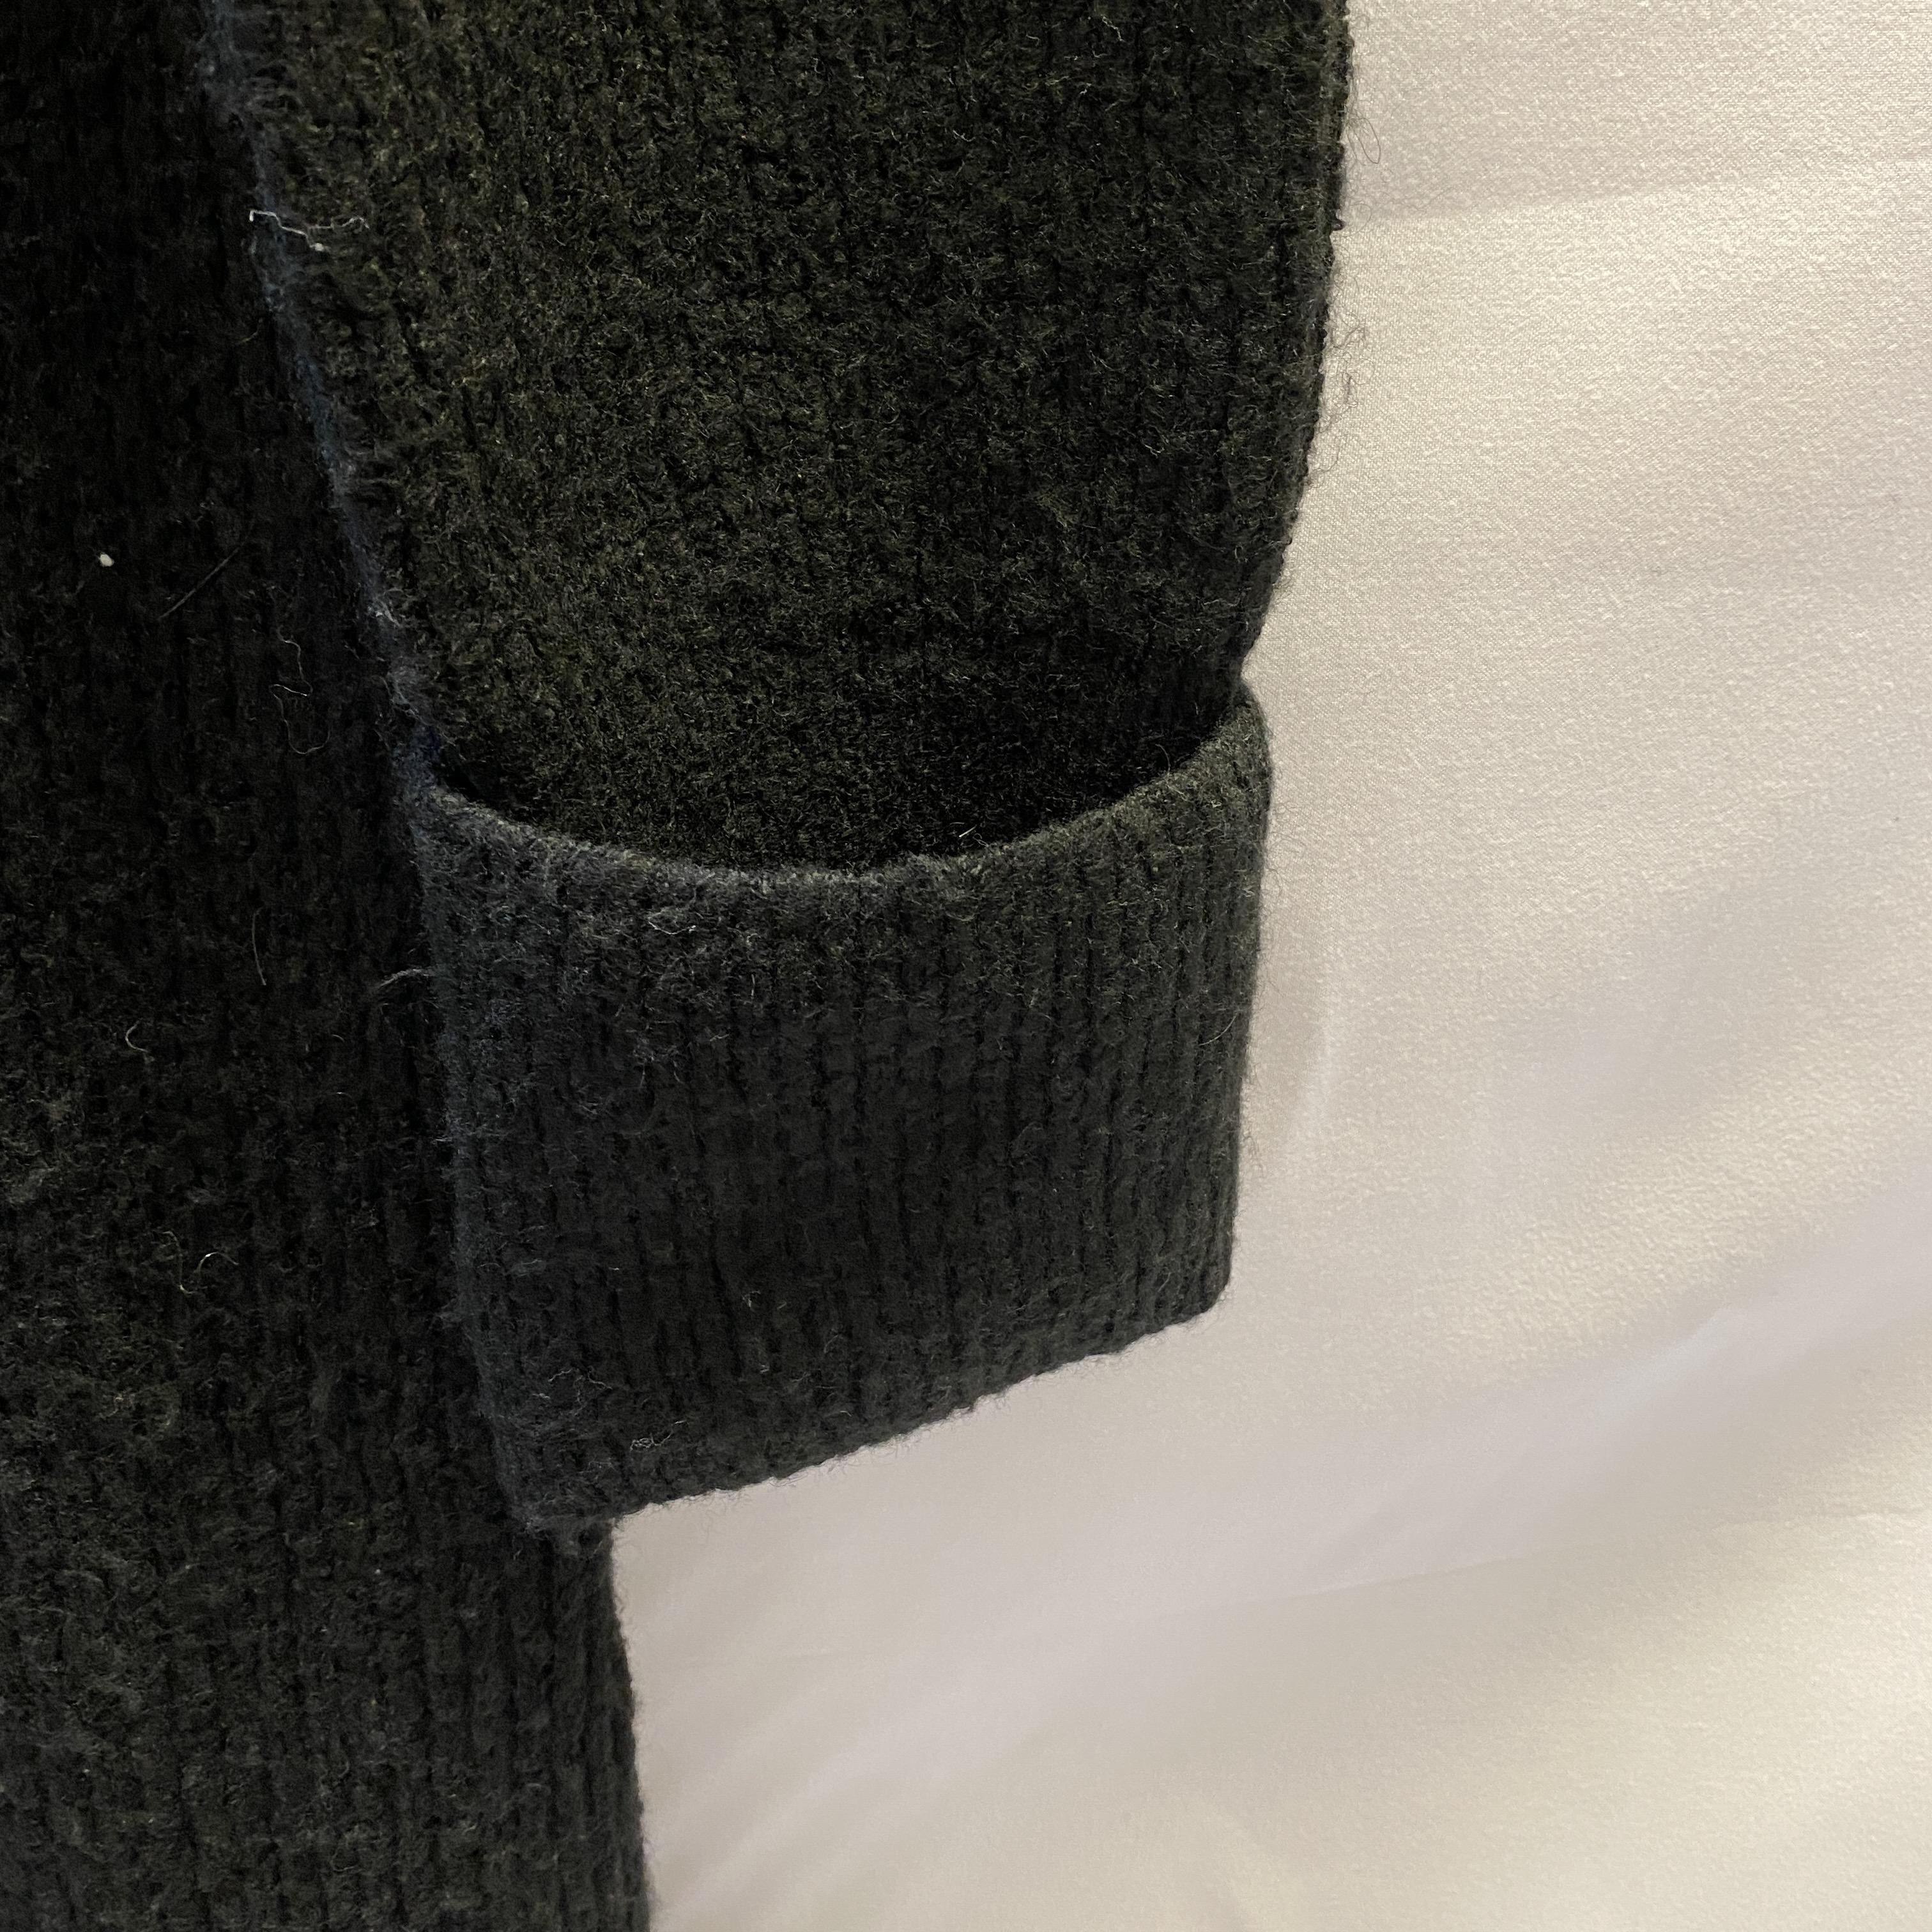 ASOS Size 12 Black Knit Jumper Dress